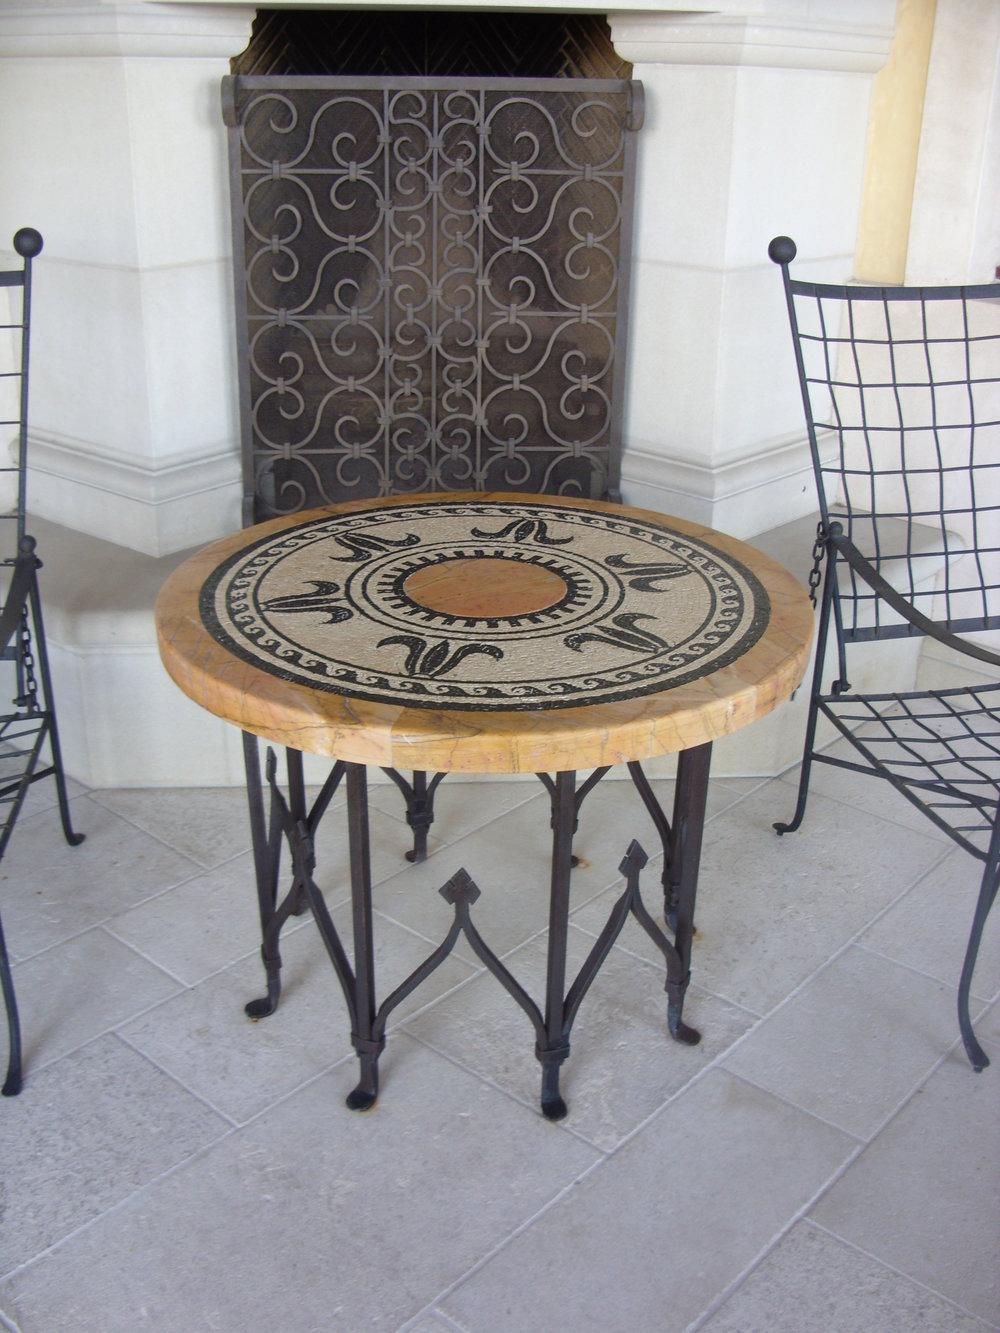 TABLE TOP INSTALL (3).jpg